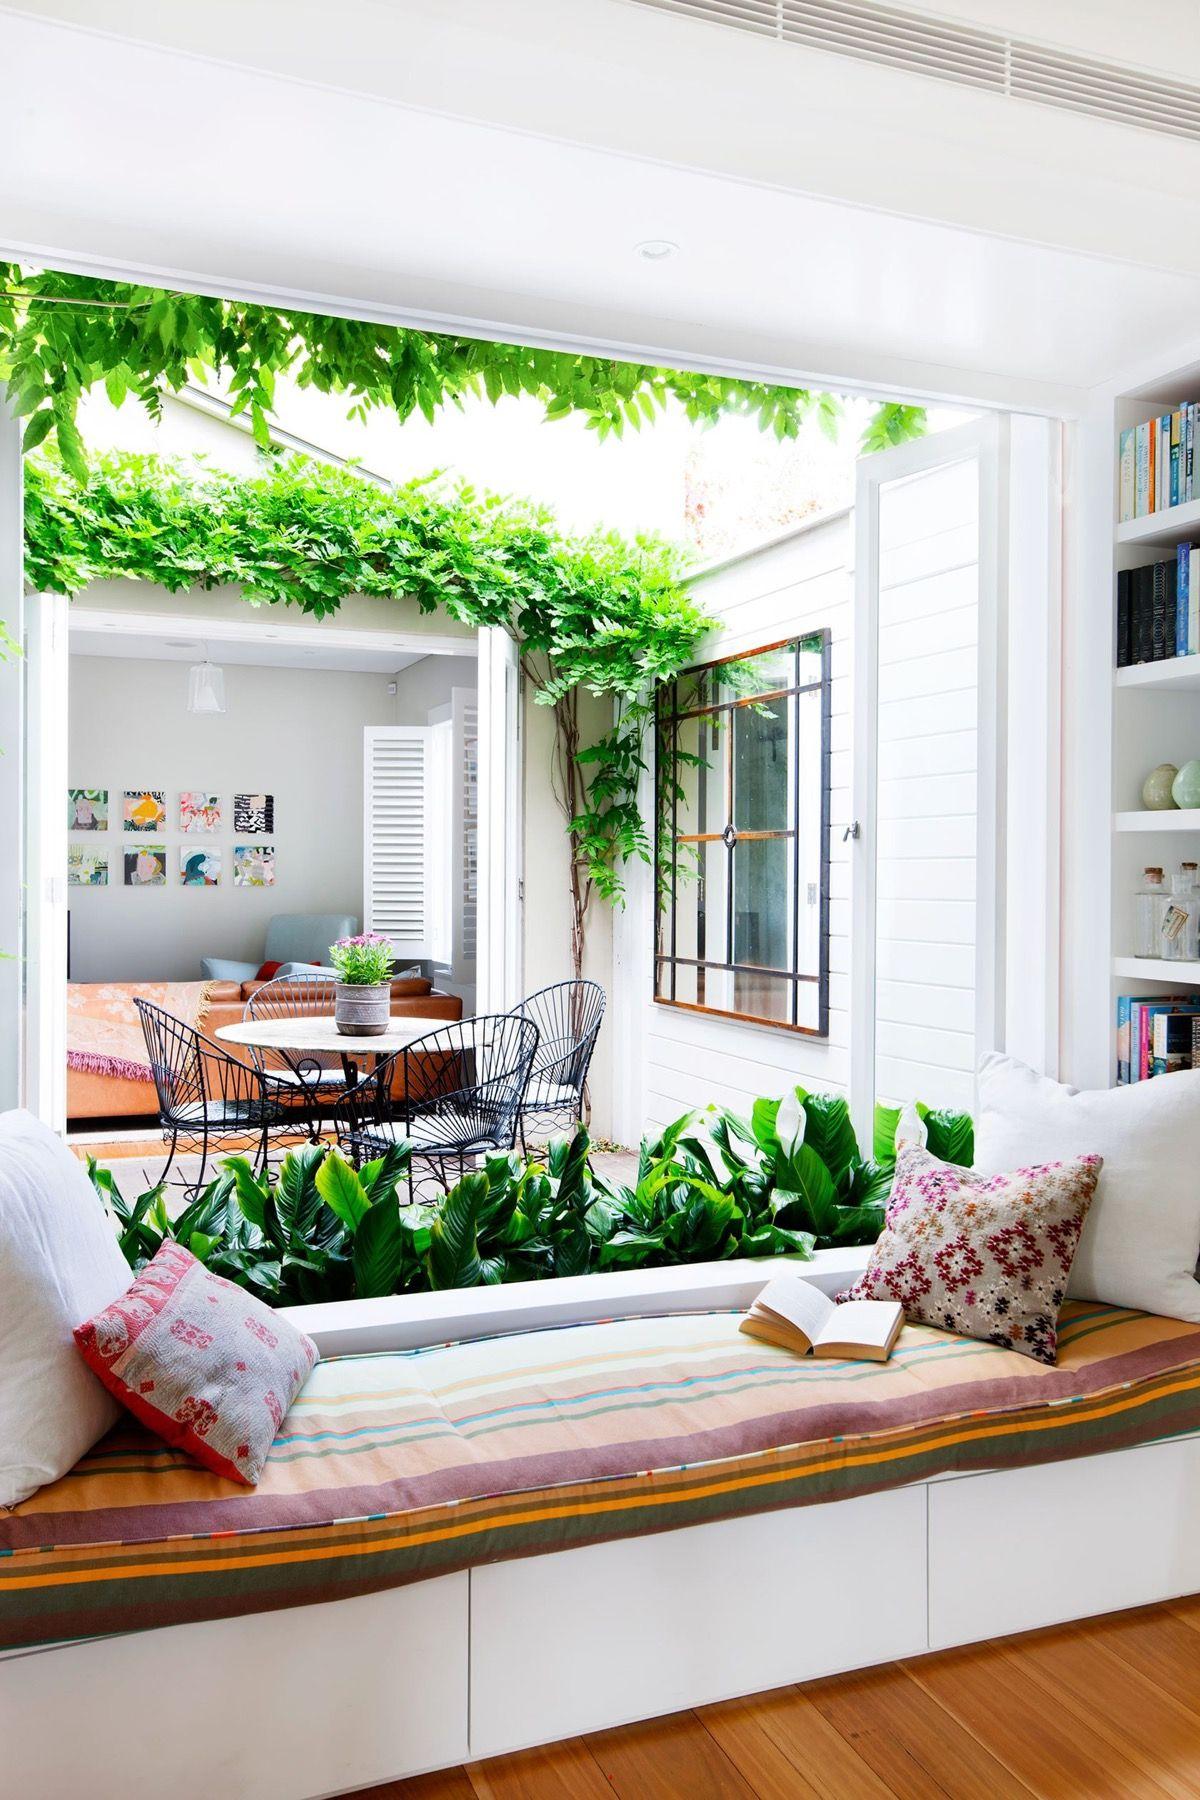 51 Window Seats To Make You Reimagine The Lowly Window Sil